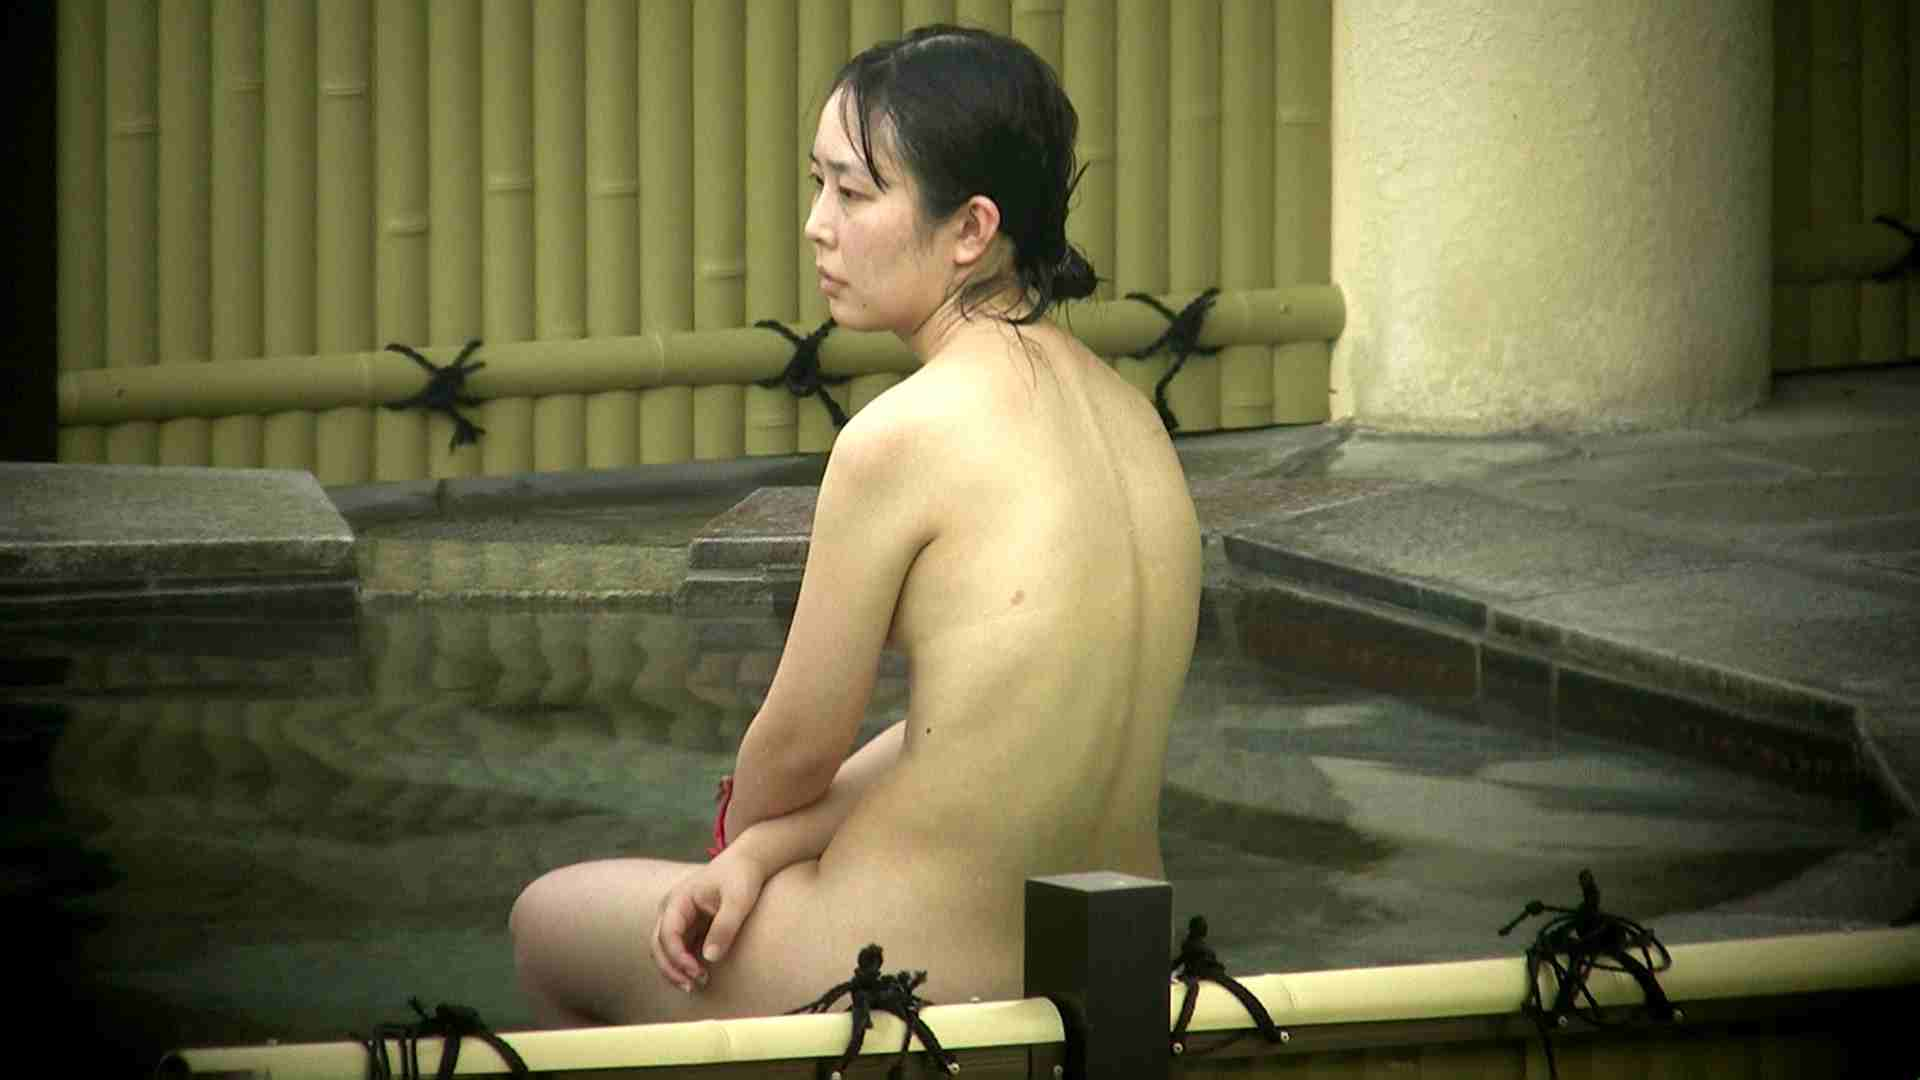 Aquaな露天風呂Vol.635 露天風呂編 | 盗撮シリーズ  77PIX 9